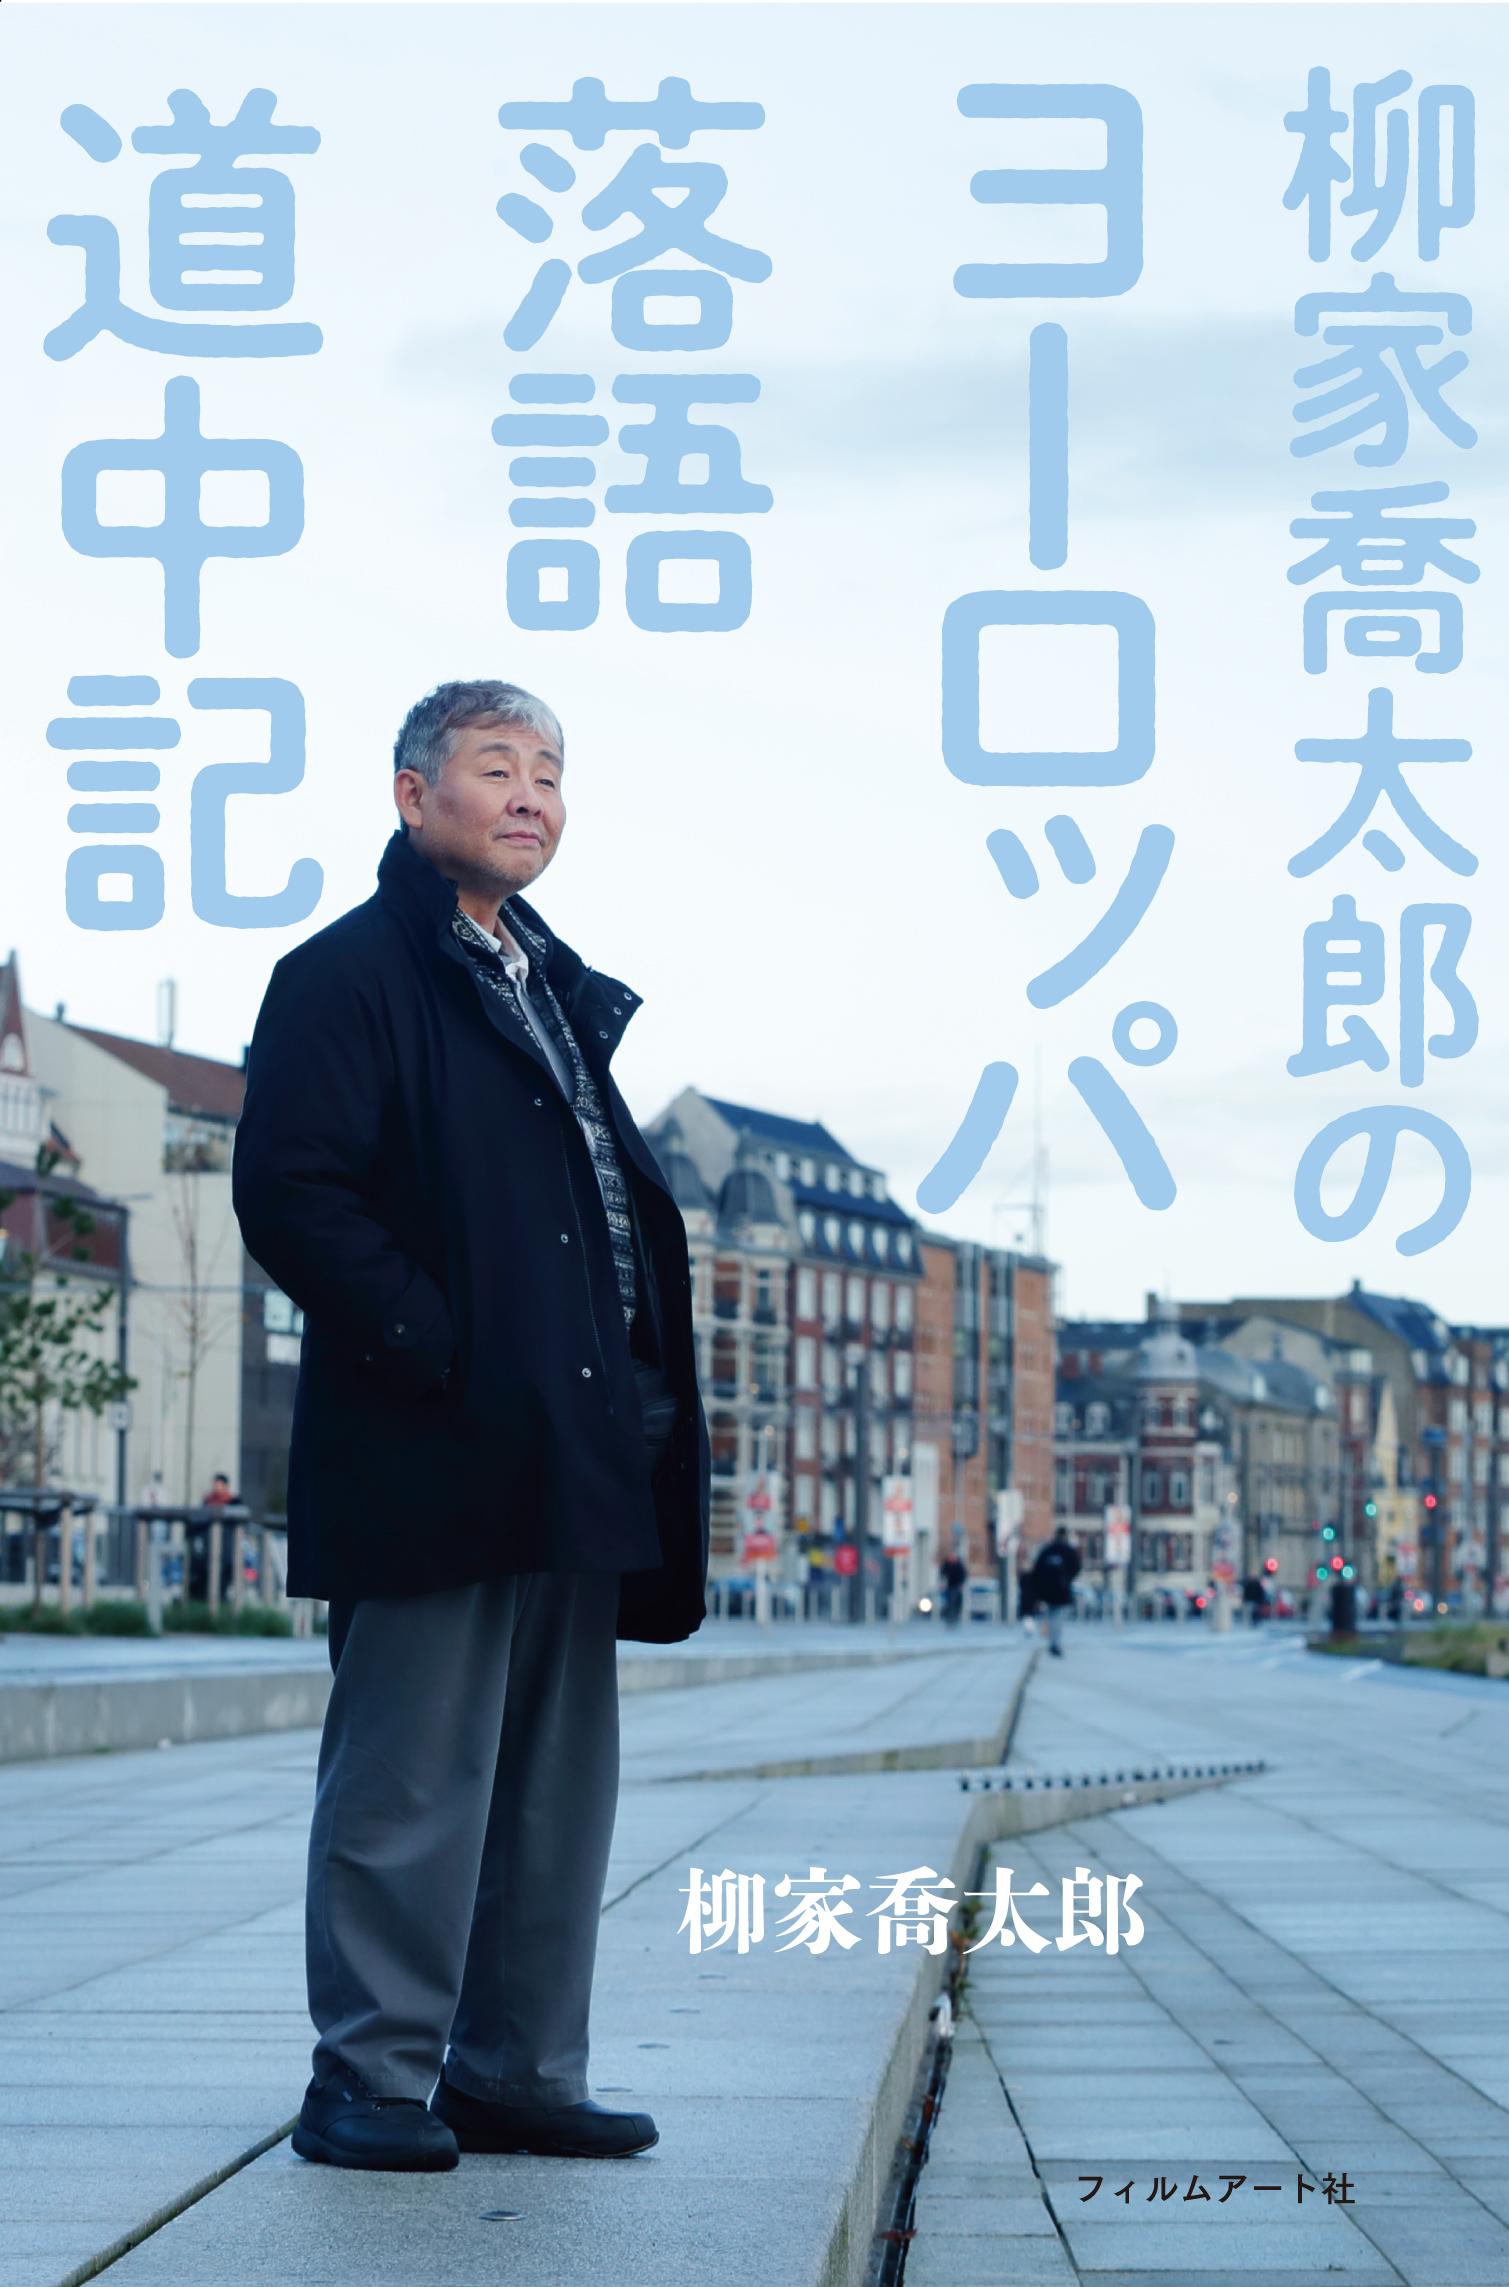 Rakugo Master praises Cambridge Japanese students in new book